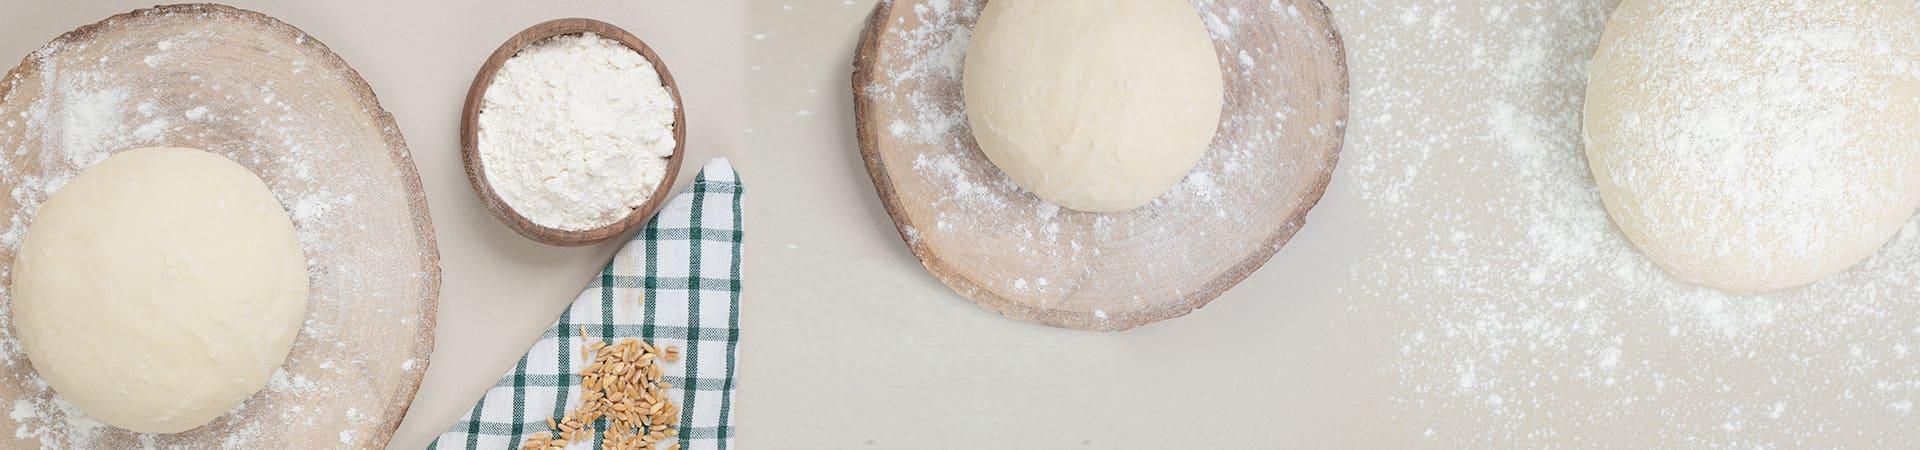 Dough and flour Manufacturing